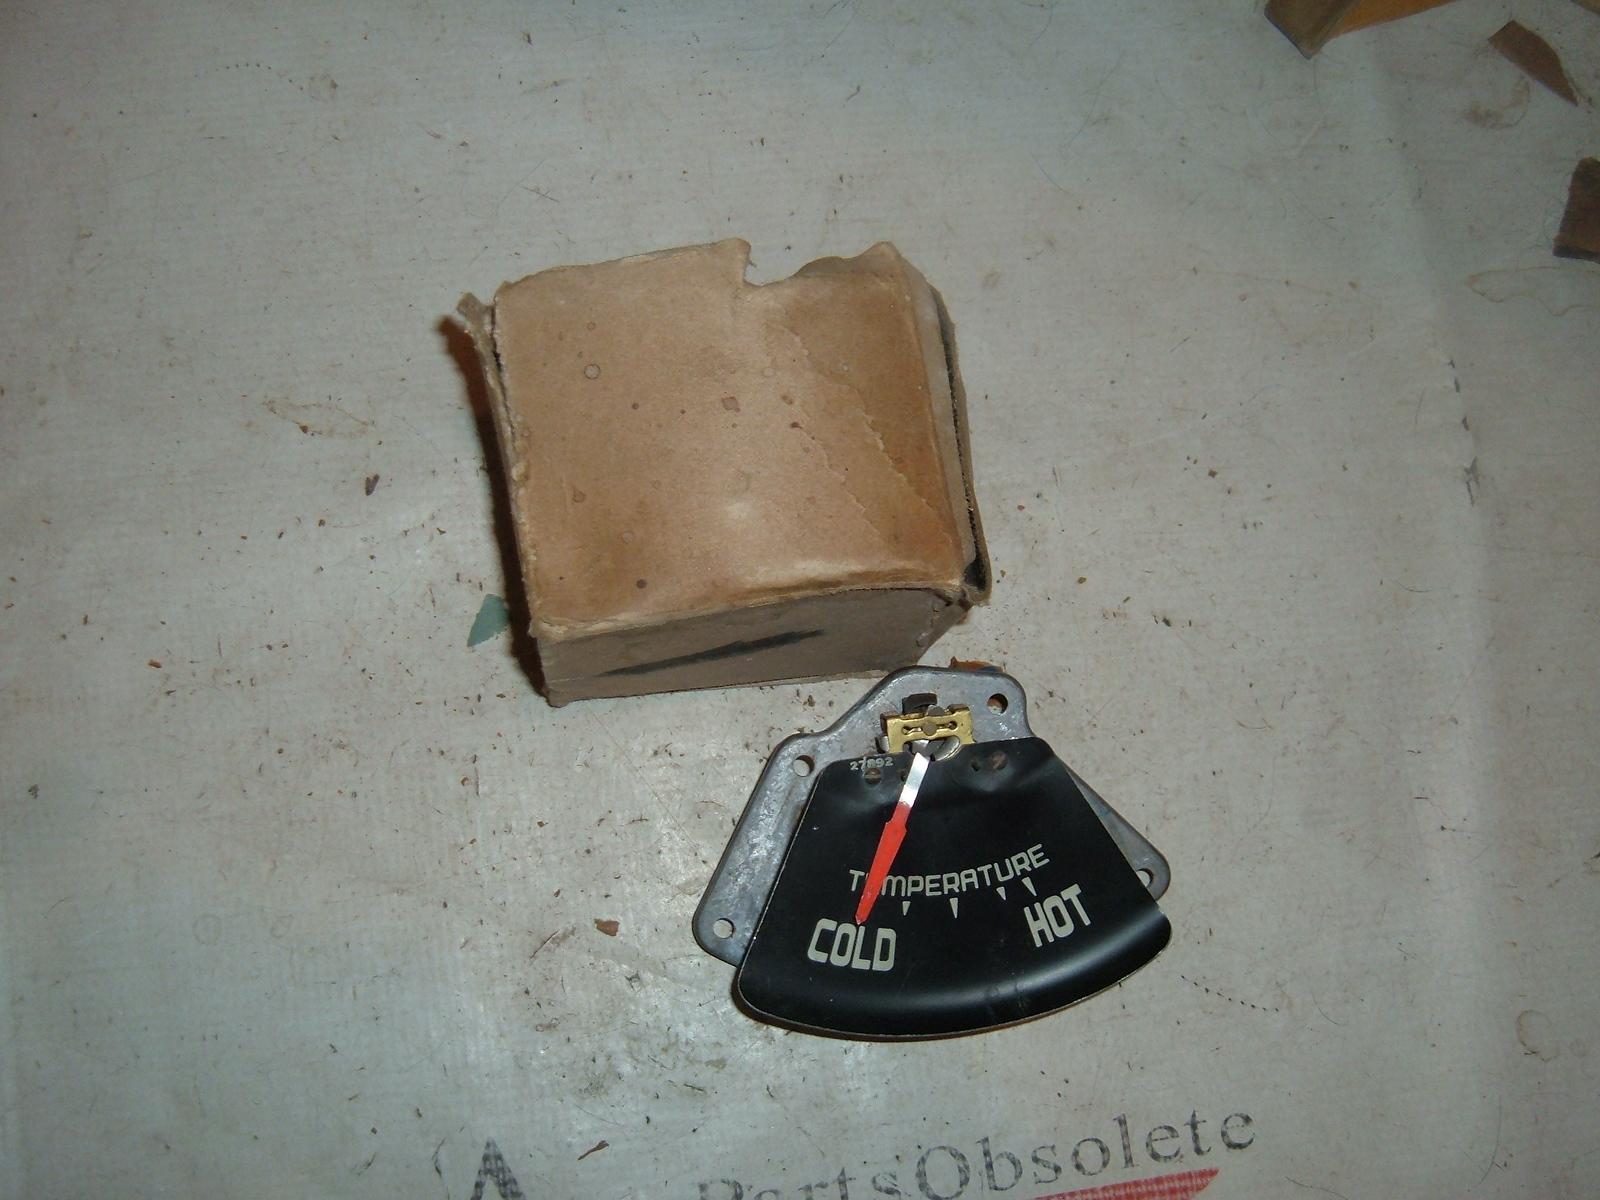 1957 1958 chrysler imperial temperature gauge nos mopar # 1753593 (z 1753593)